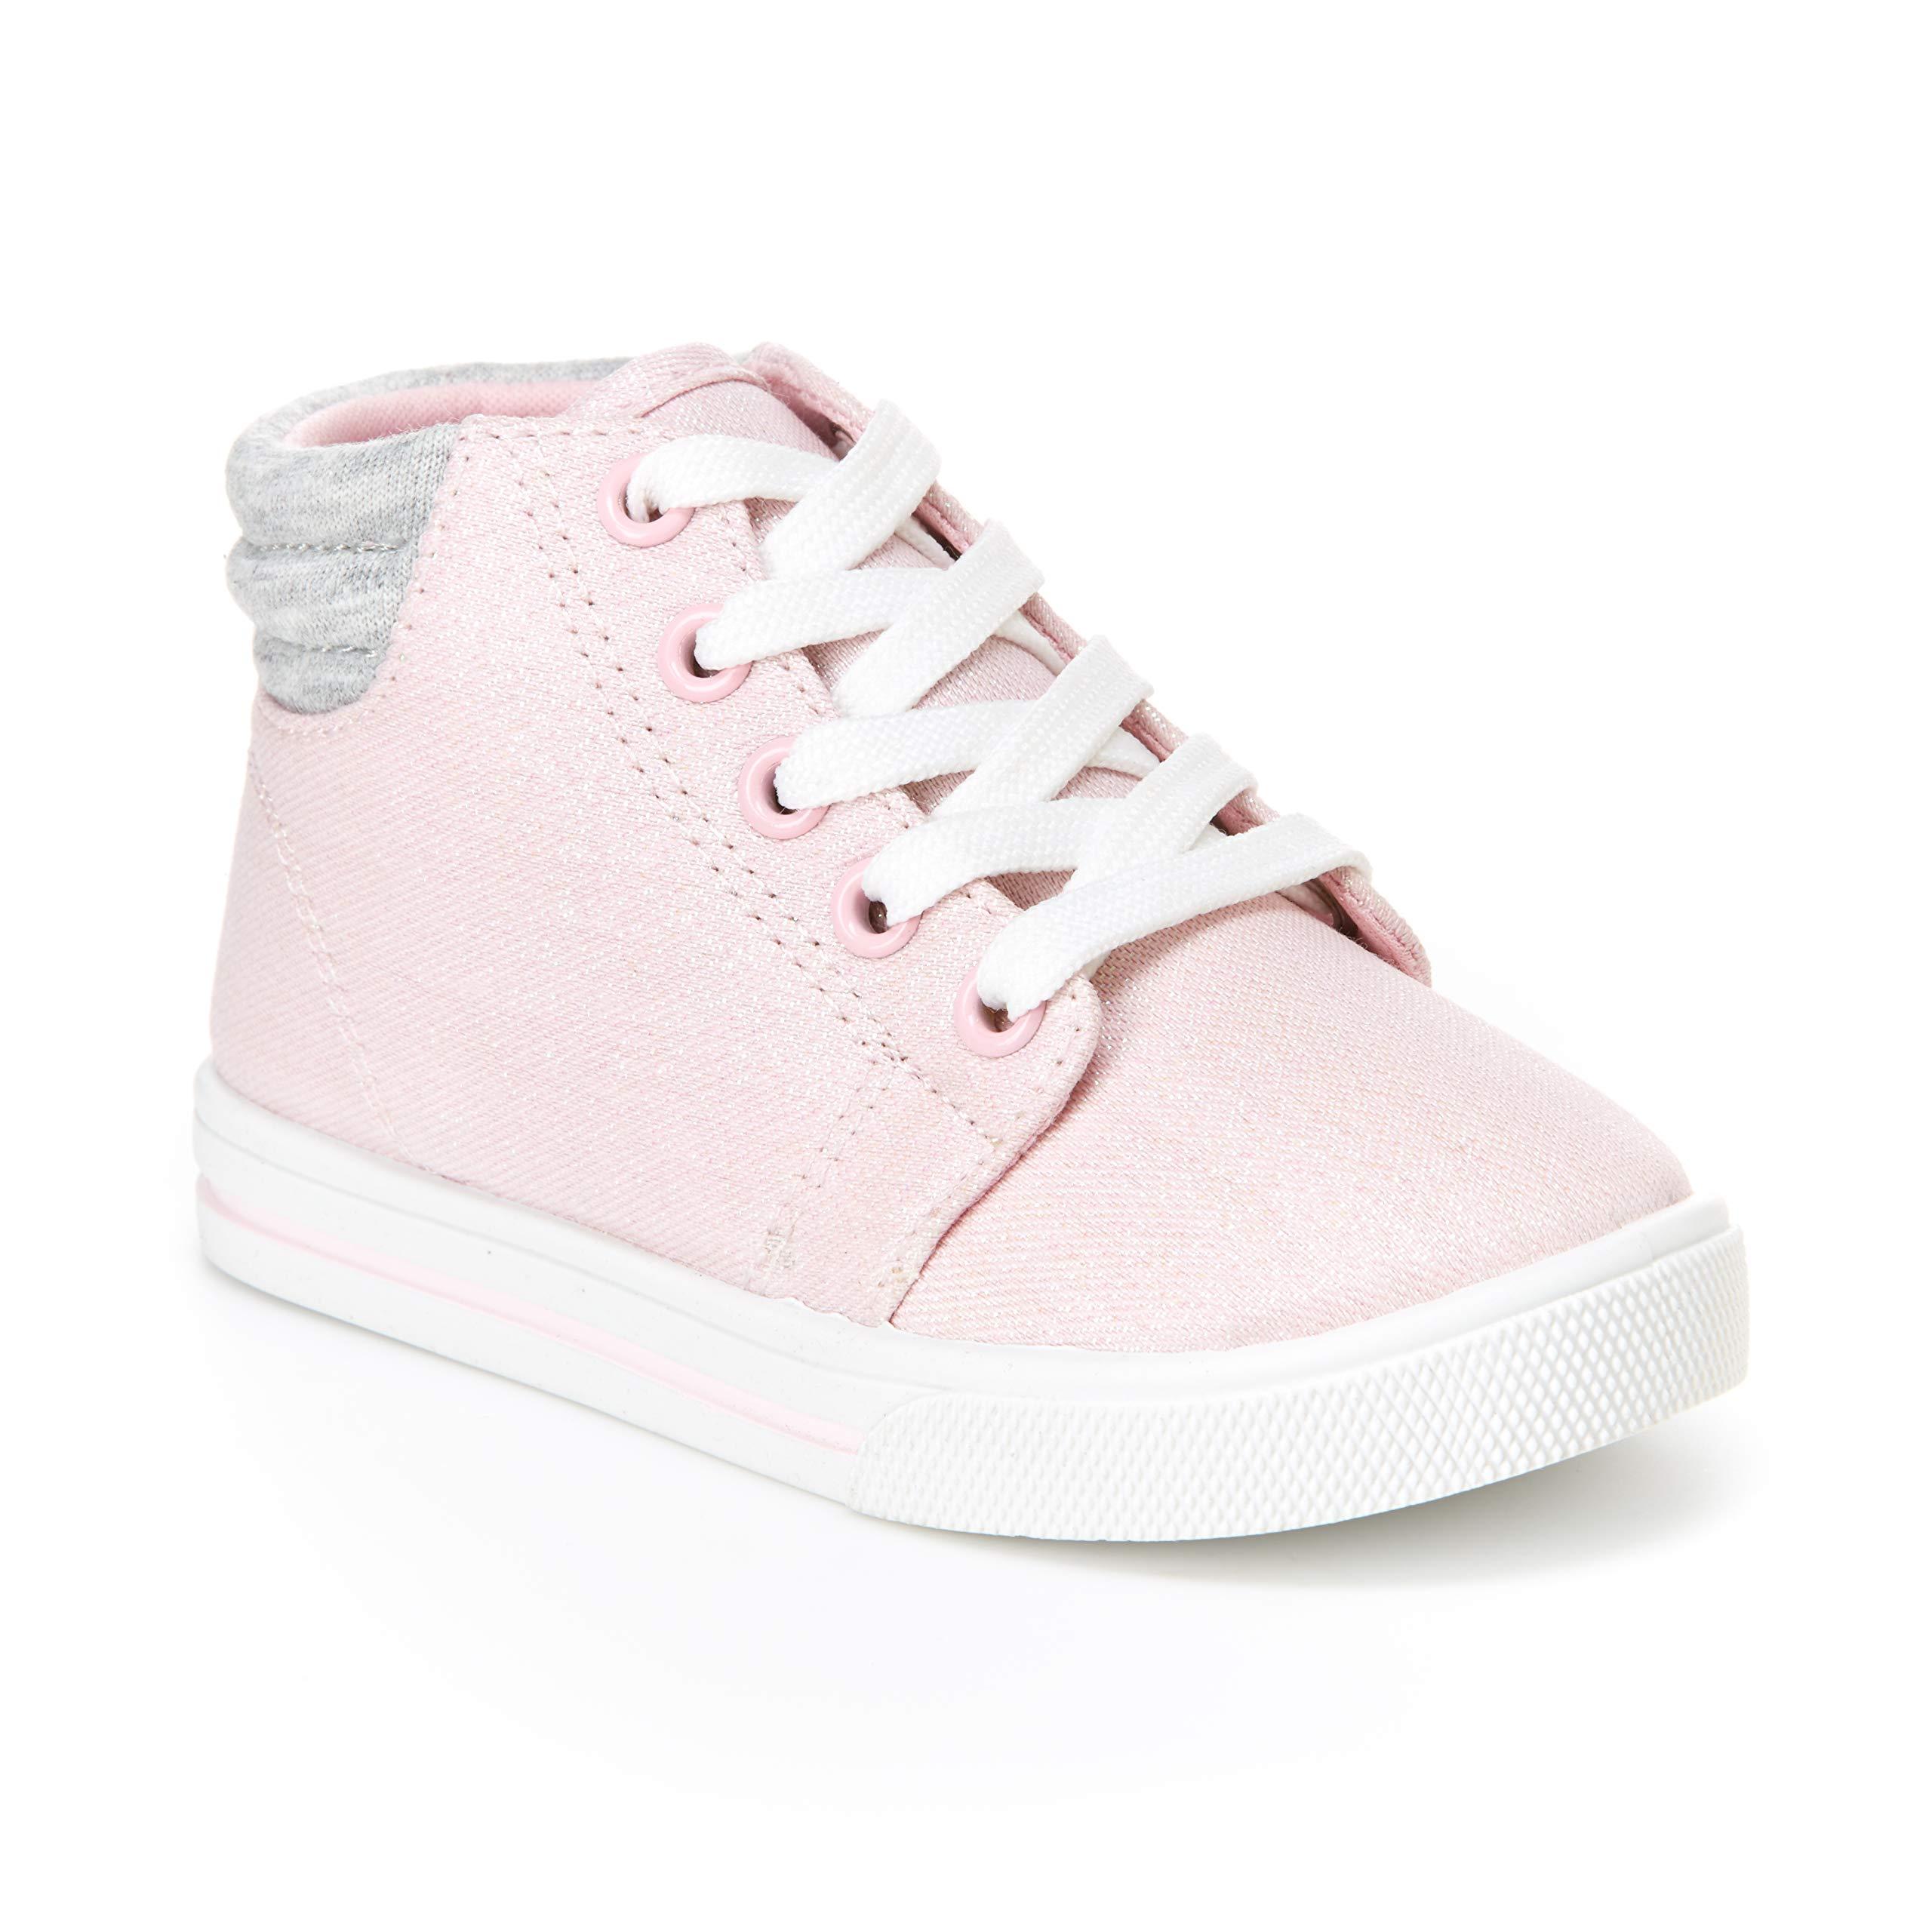 Simple Joys Carters High Top Sneaker